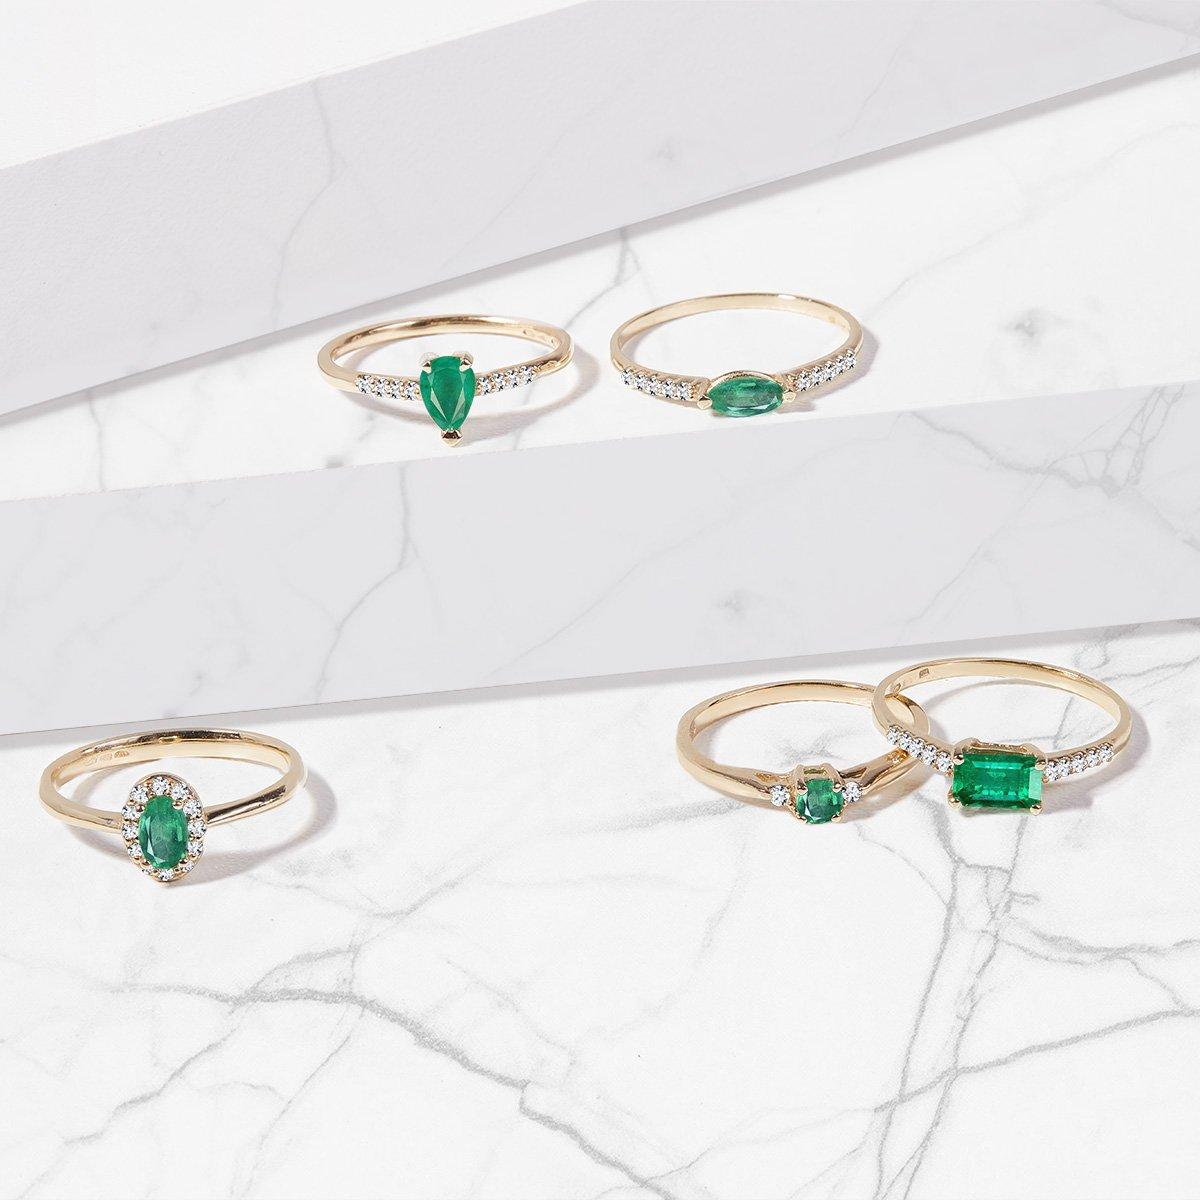 Emerald yellow gold ring